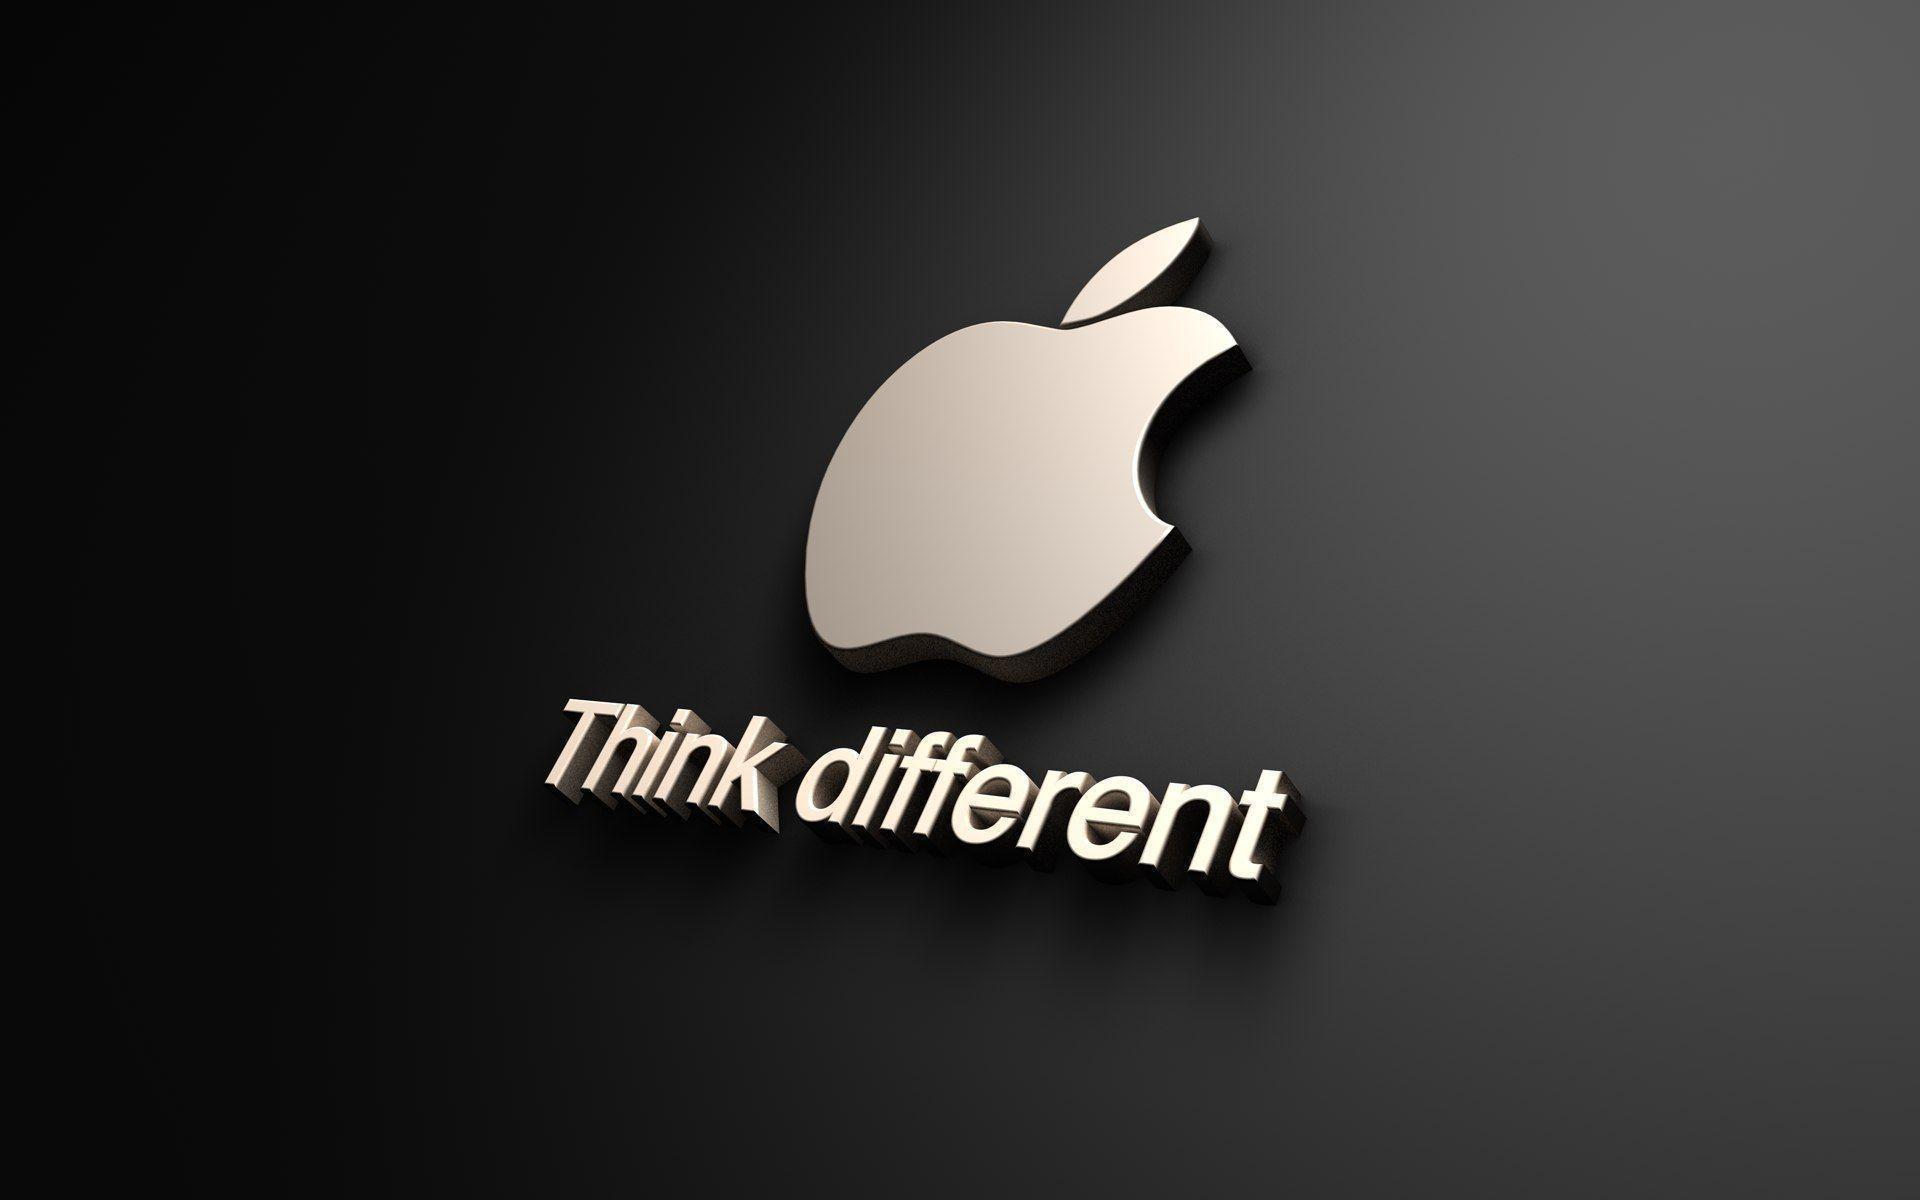 cool apple logo – 1920×1200 Download Free Wallpaper, Background .